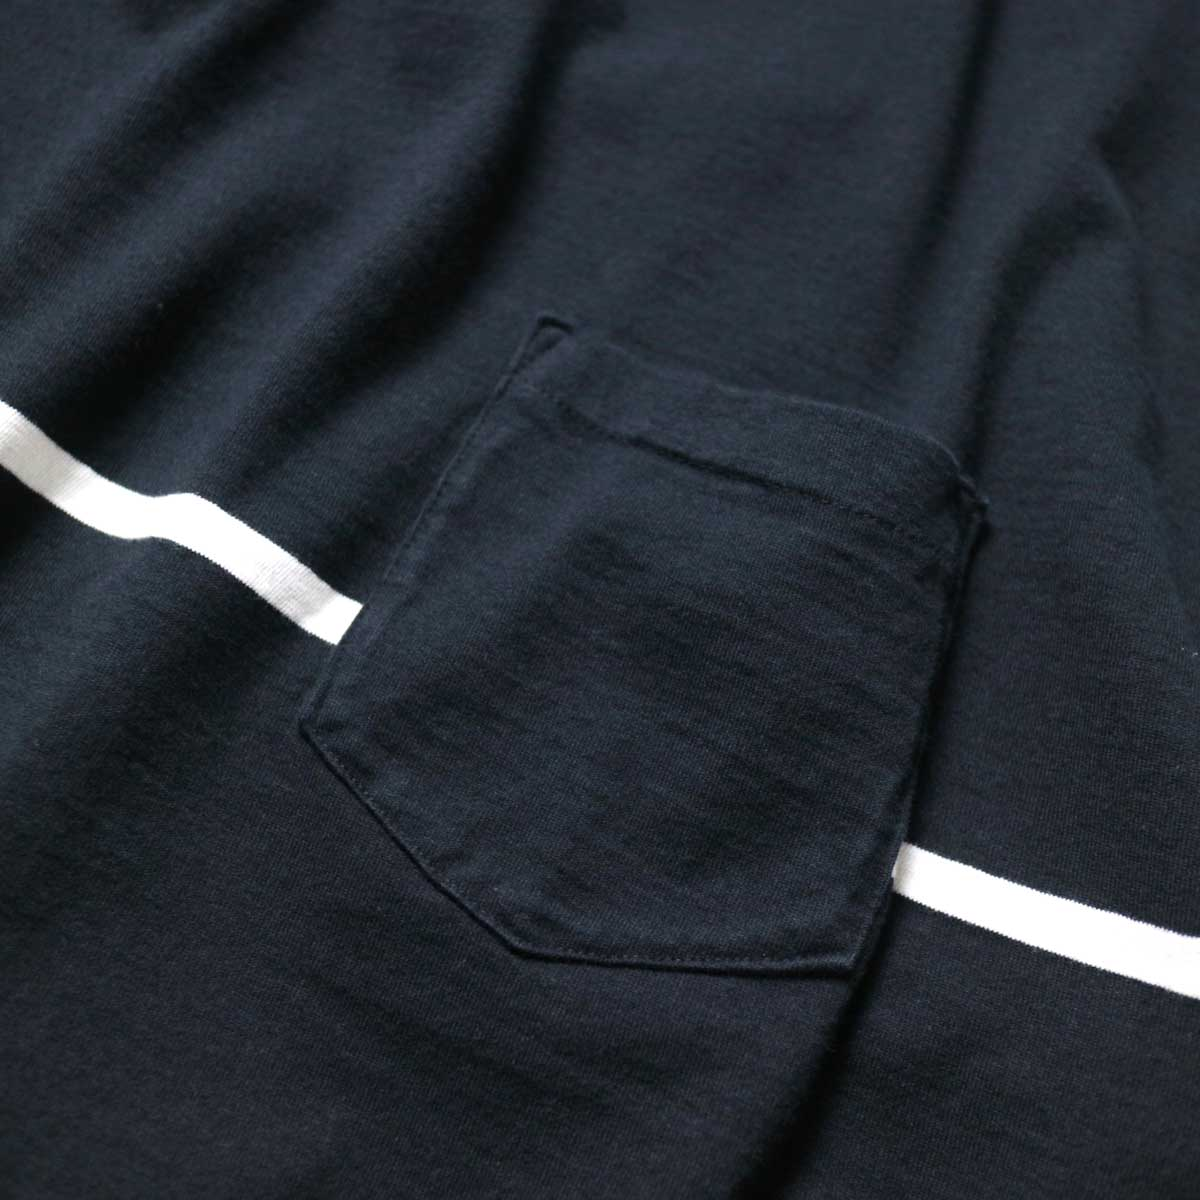 REMI RELIEF / 24Gパネル胸ボーダー七分袖 (Black)ポケット